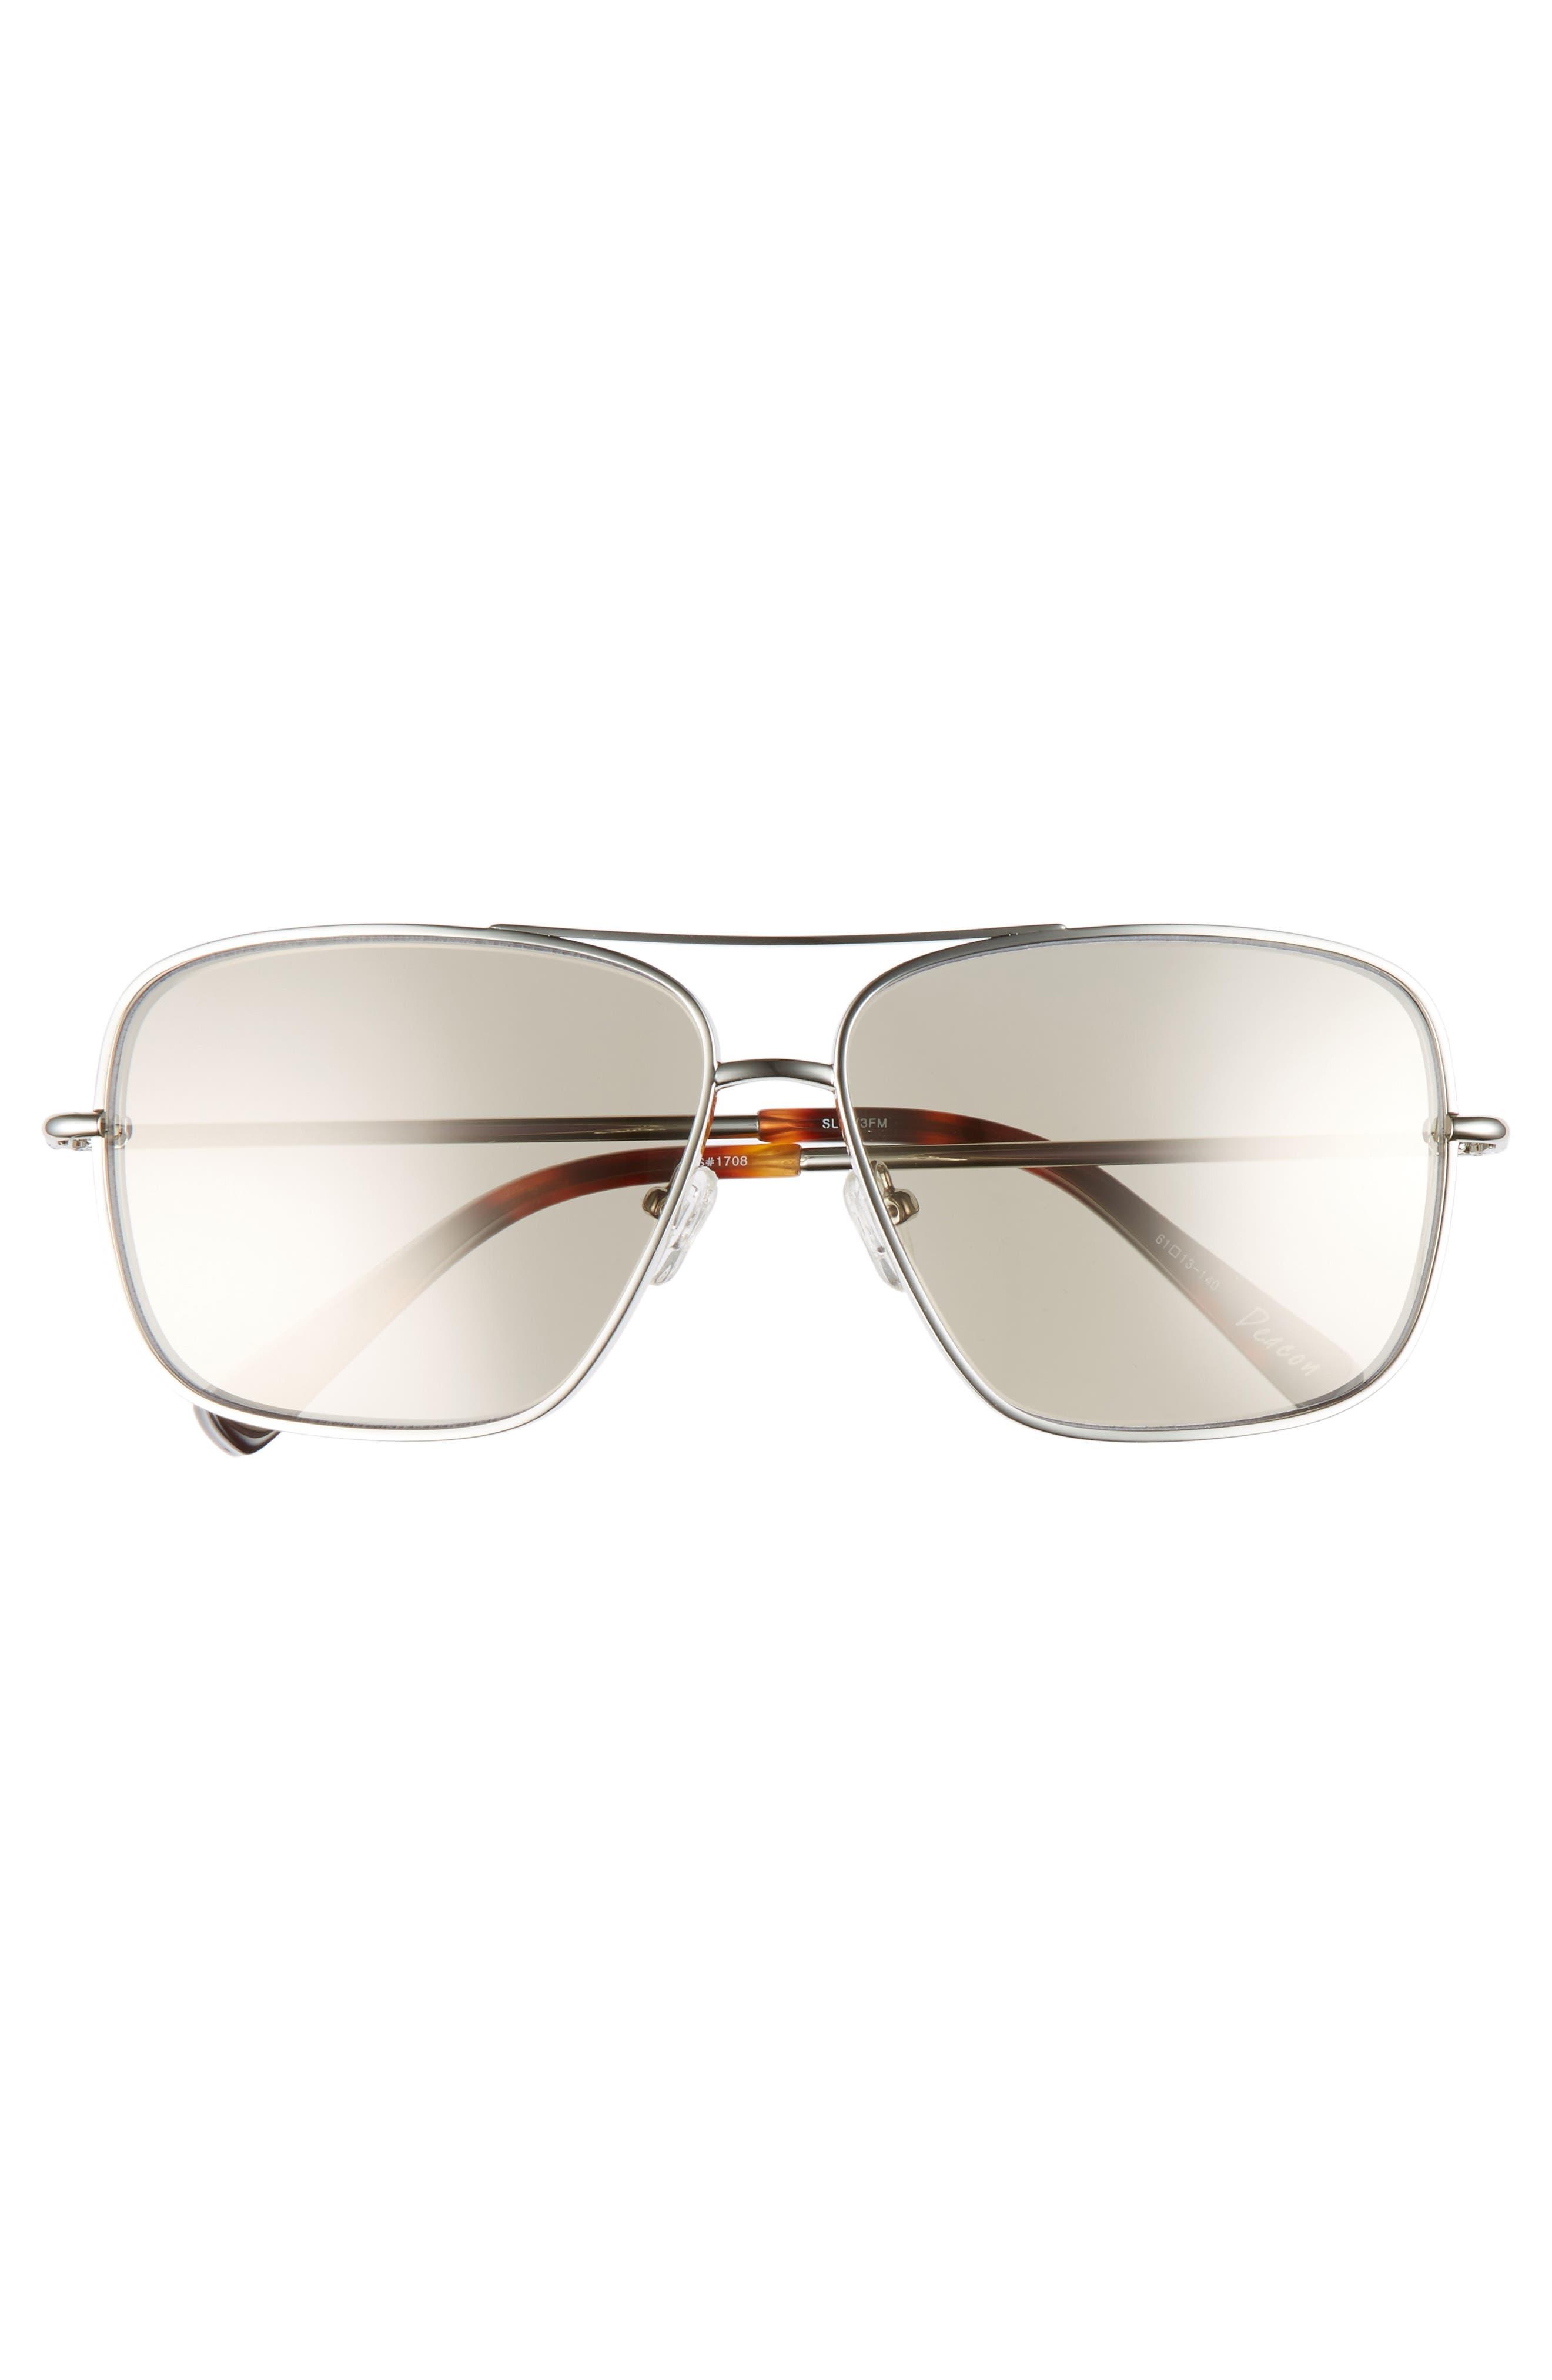 Deacon 61mm Aviator Sunglasses,                             Alternate thumbnail 3, color,                             040